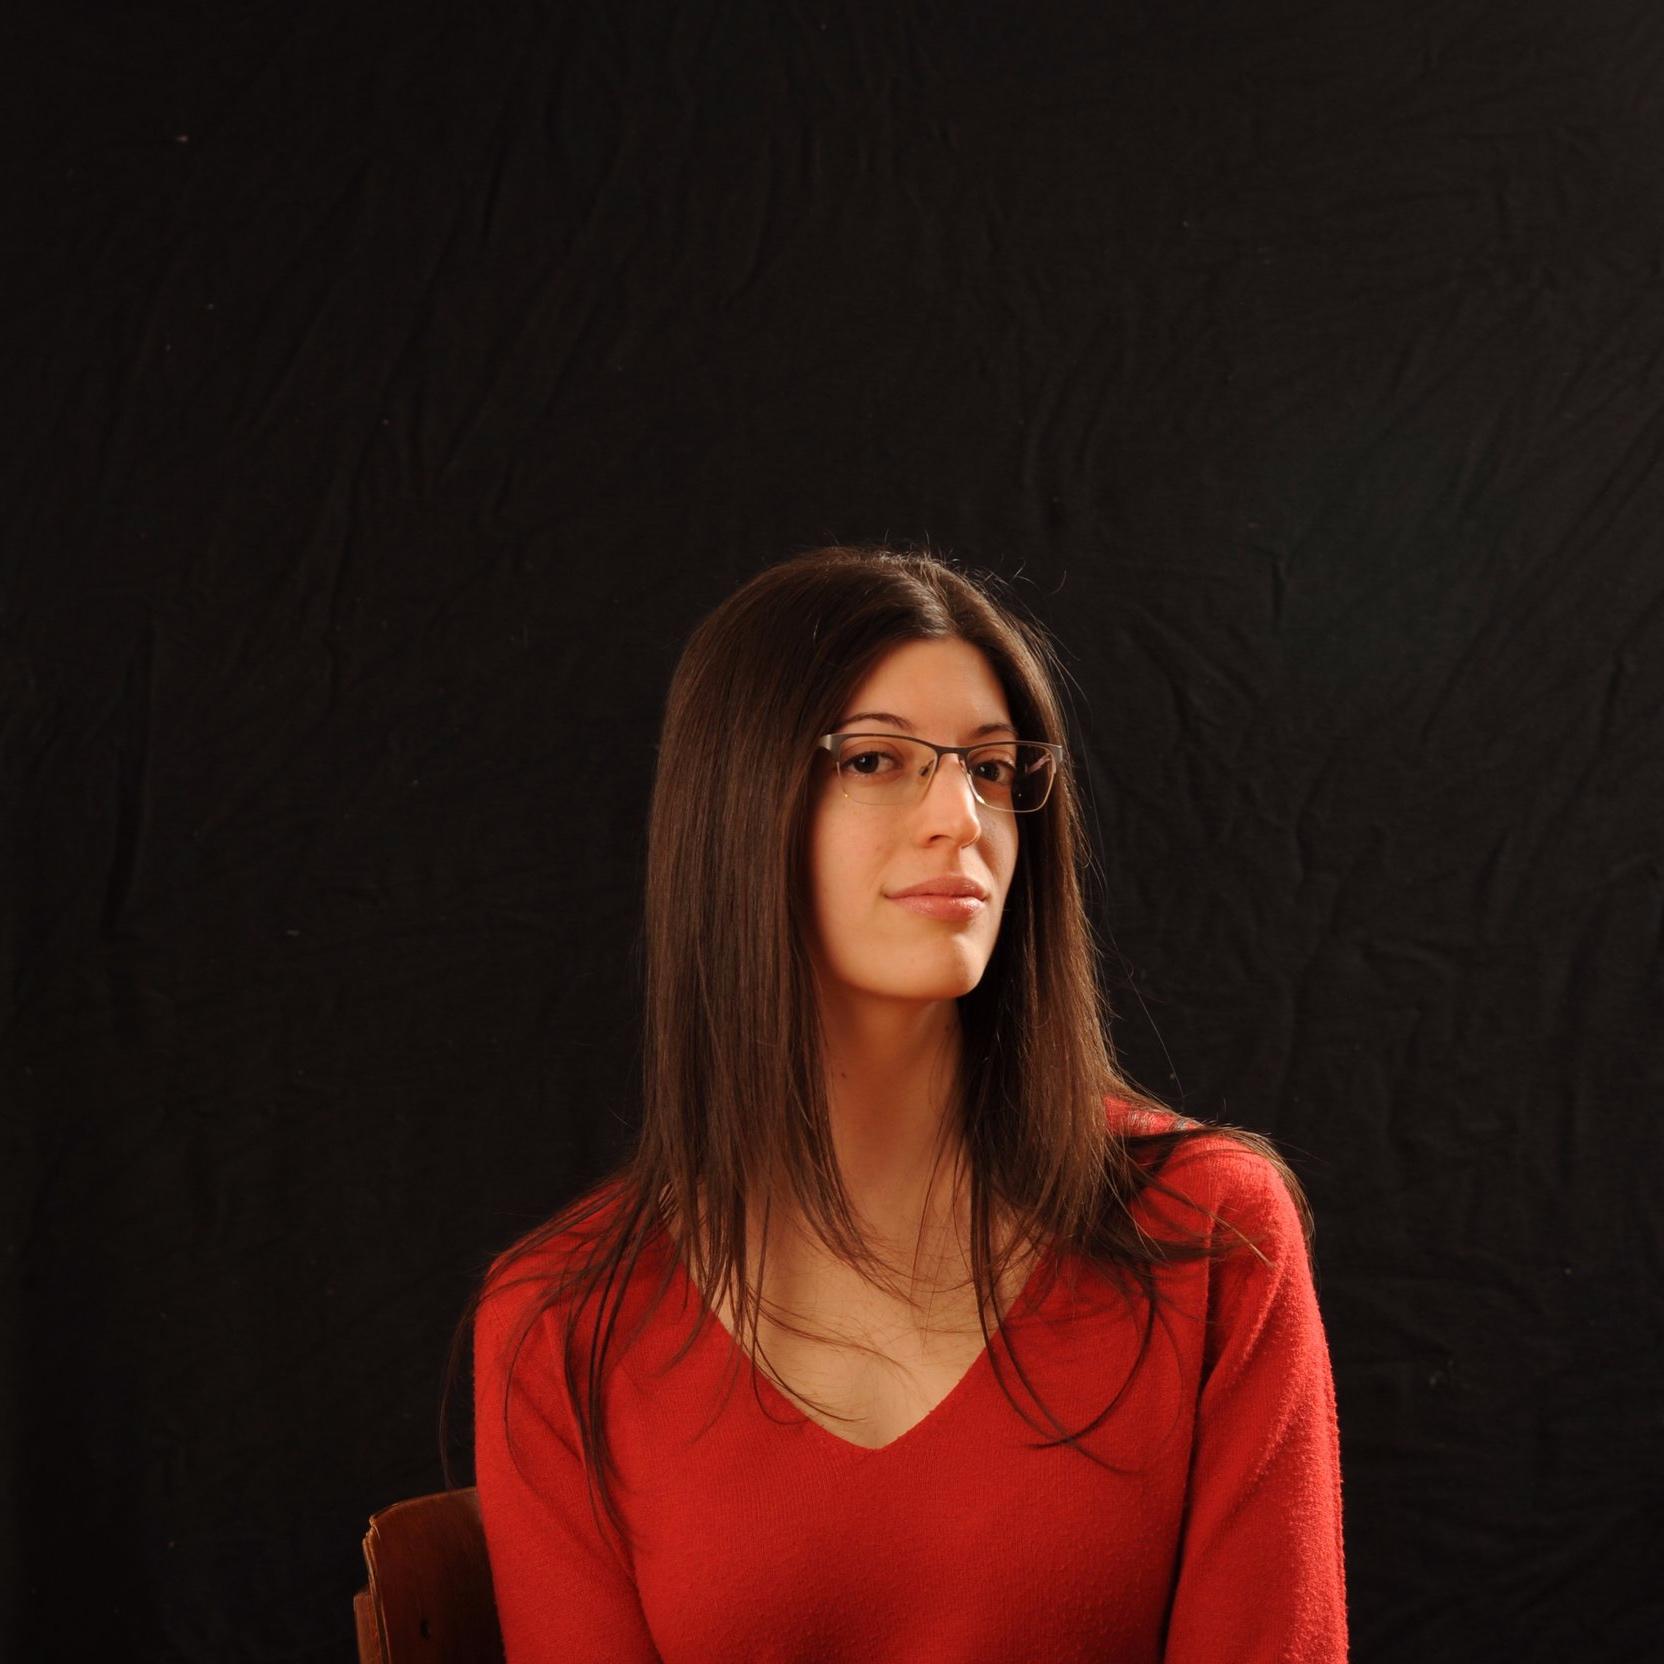 Elisabetta Cuccaro - Artista visiva